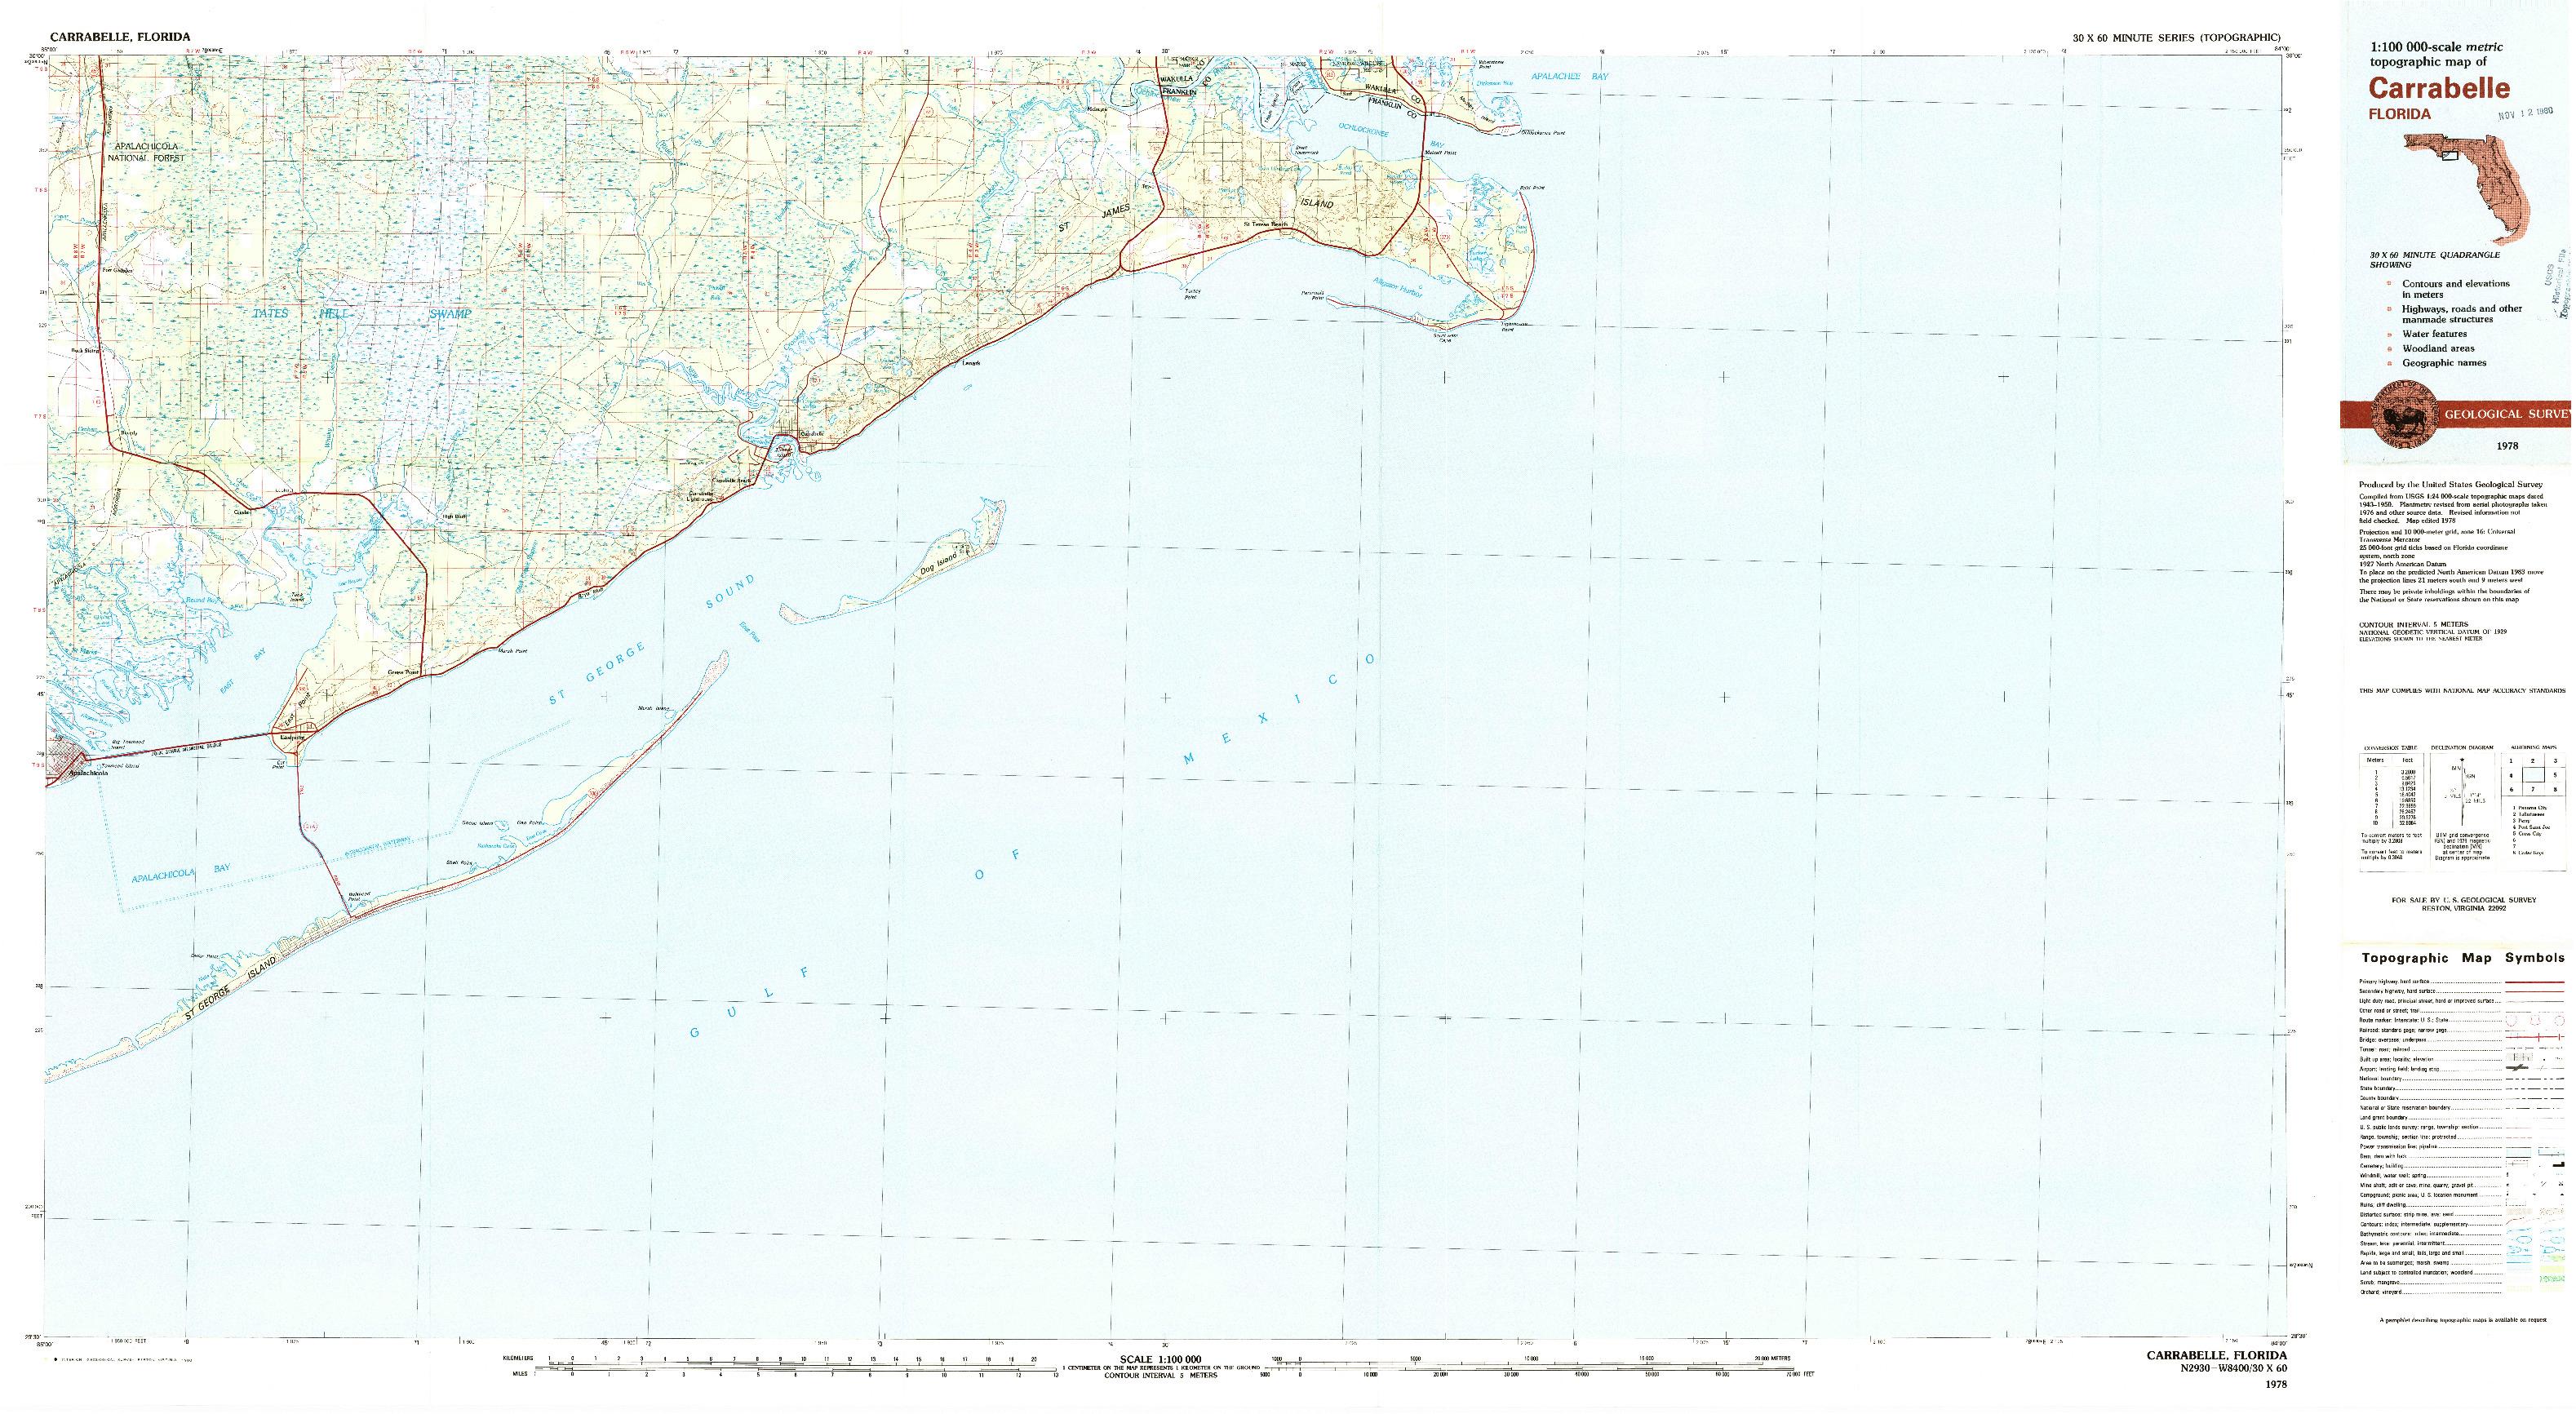 Usgs 1:100000-Scale Quadrangle For Carrabelle, Fl 1978 - Carrabelle Florida Map